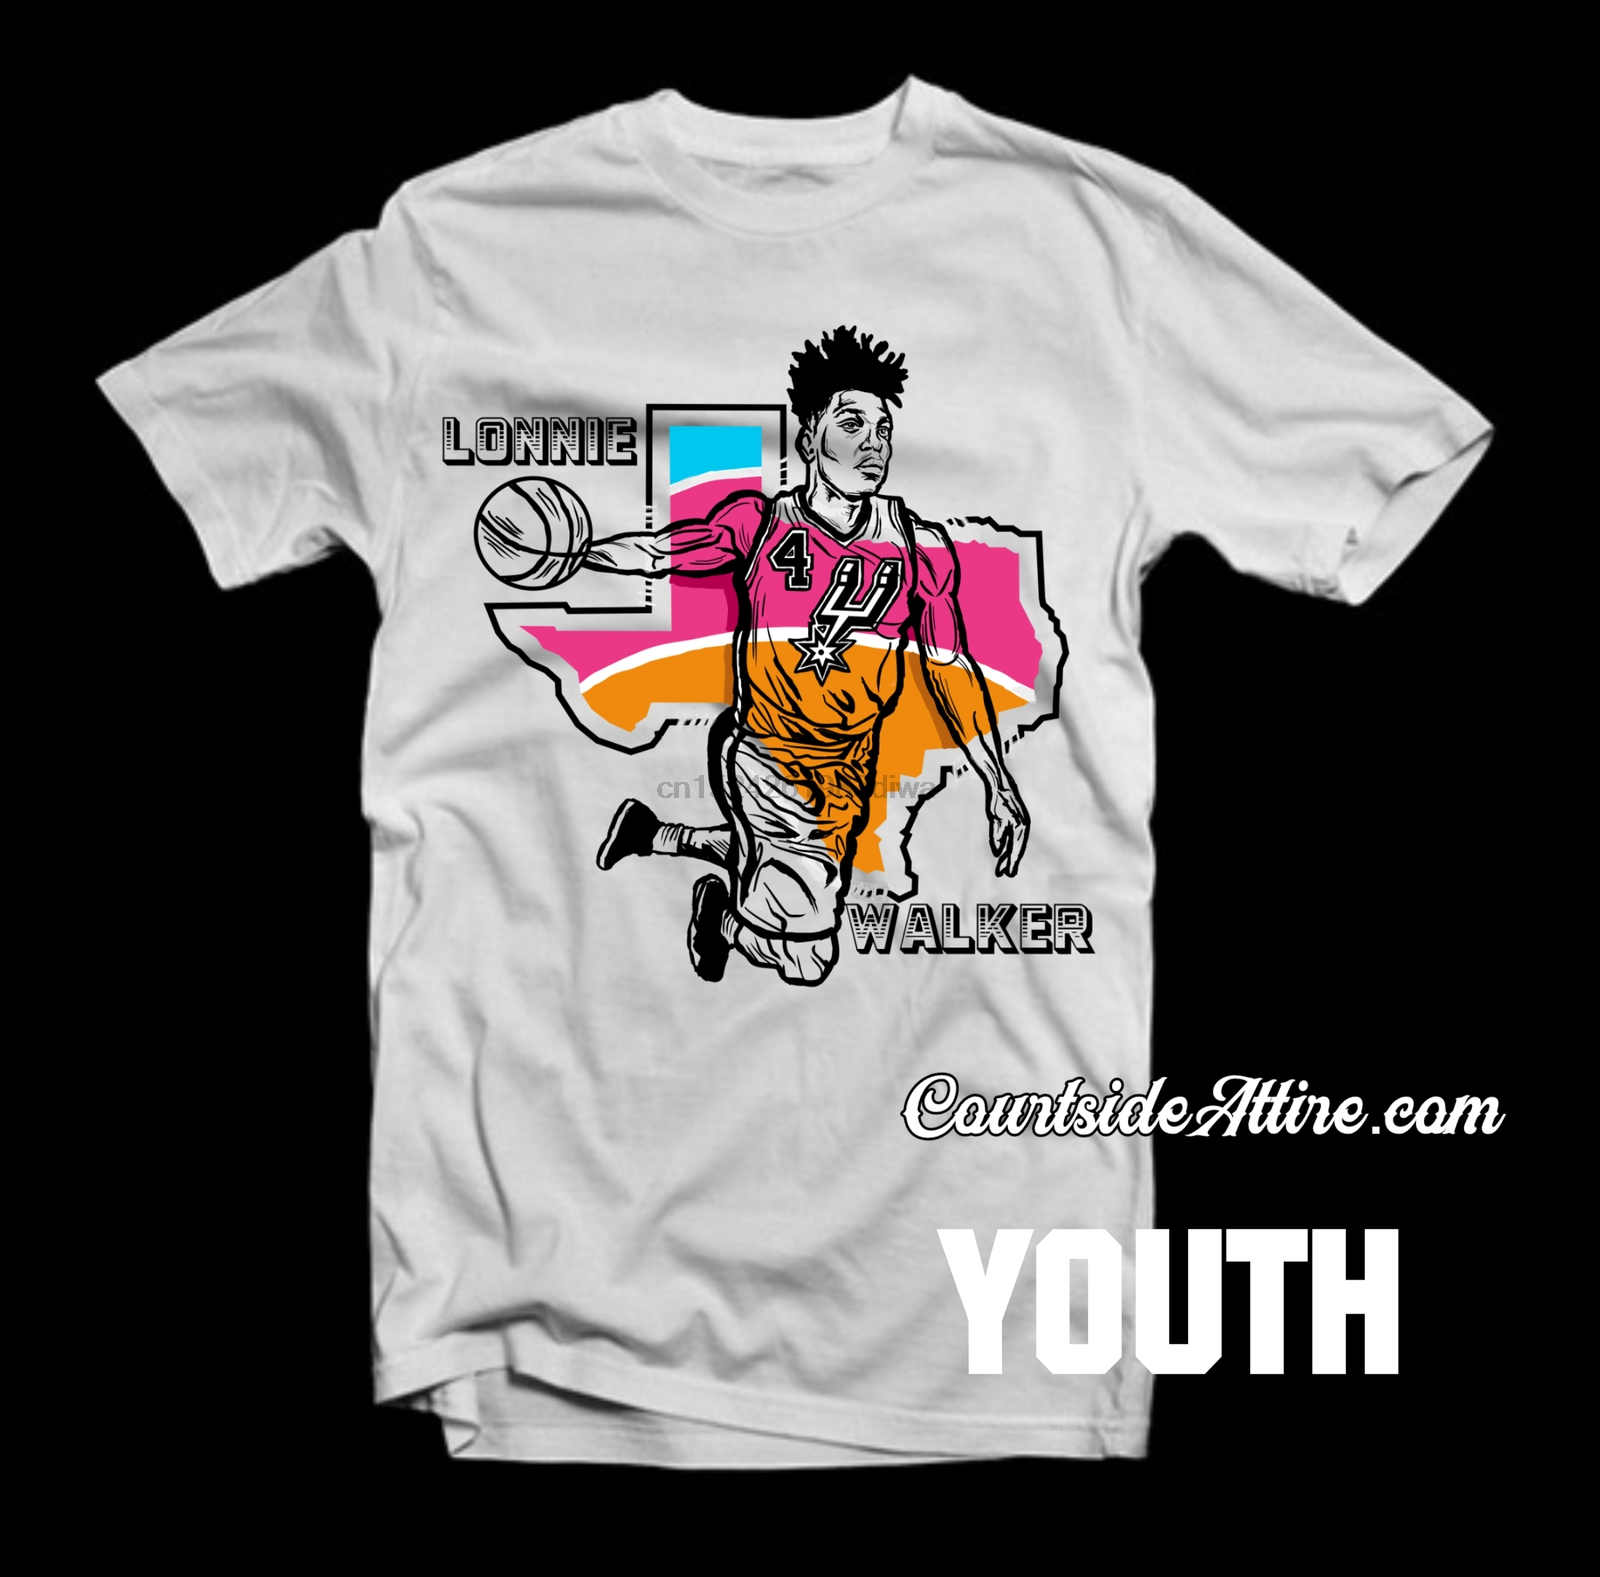 Youth Lonnie Walker San Antonio Shirt Kids Jersey In T